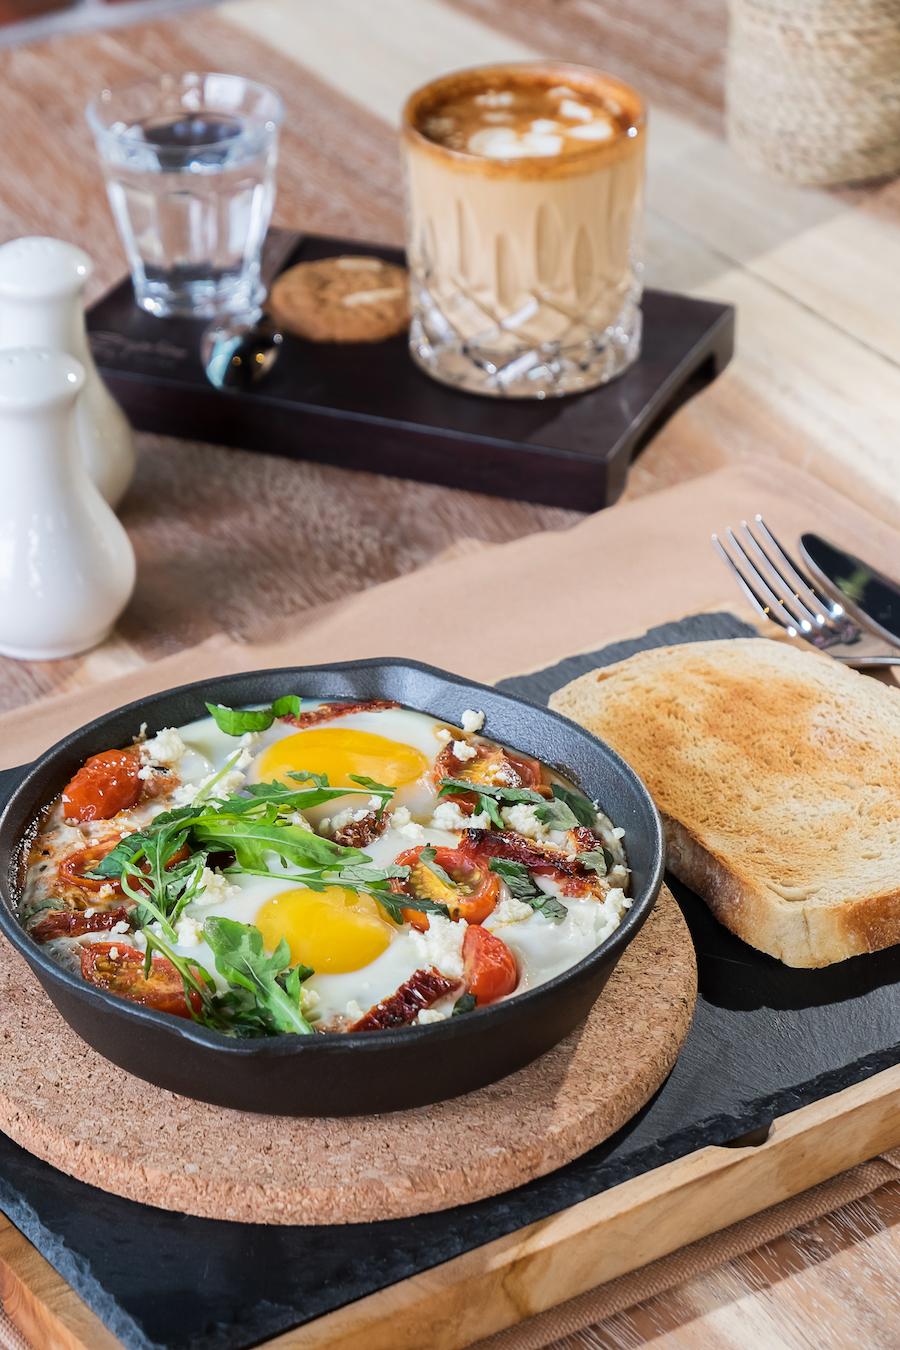 Eruption Bistro & Coffee Bali Baked Eggs